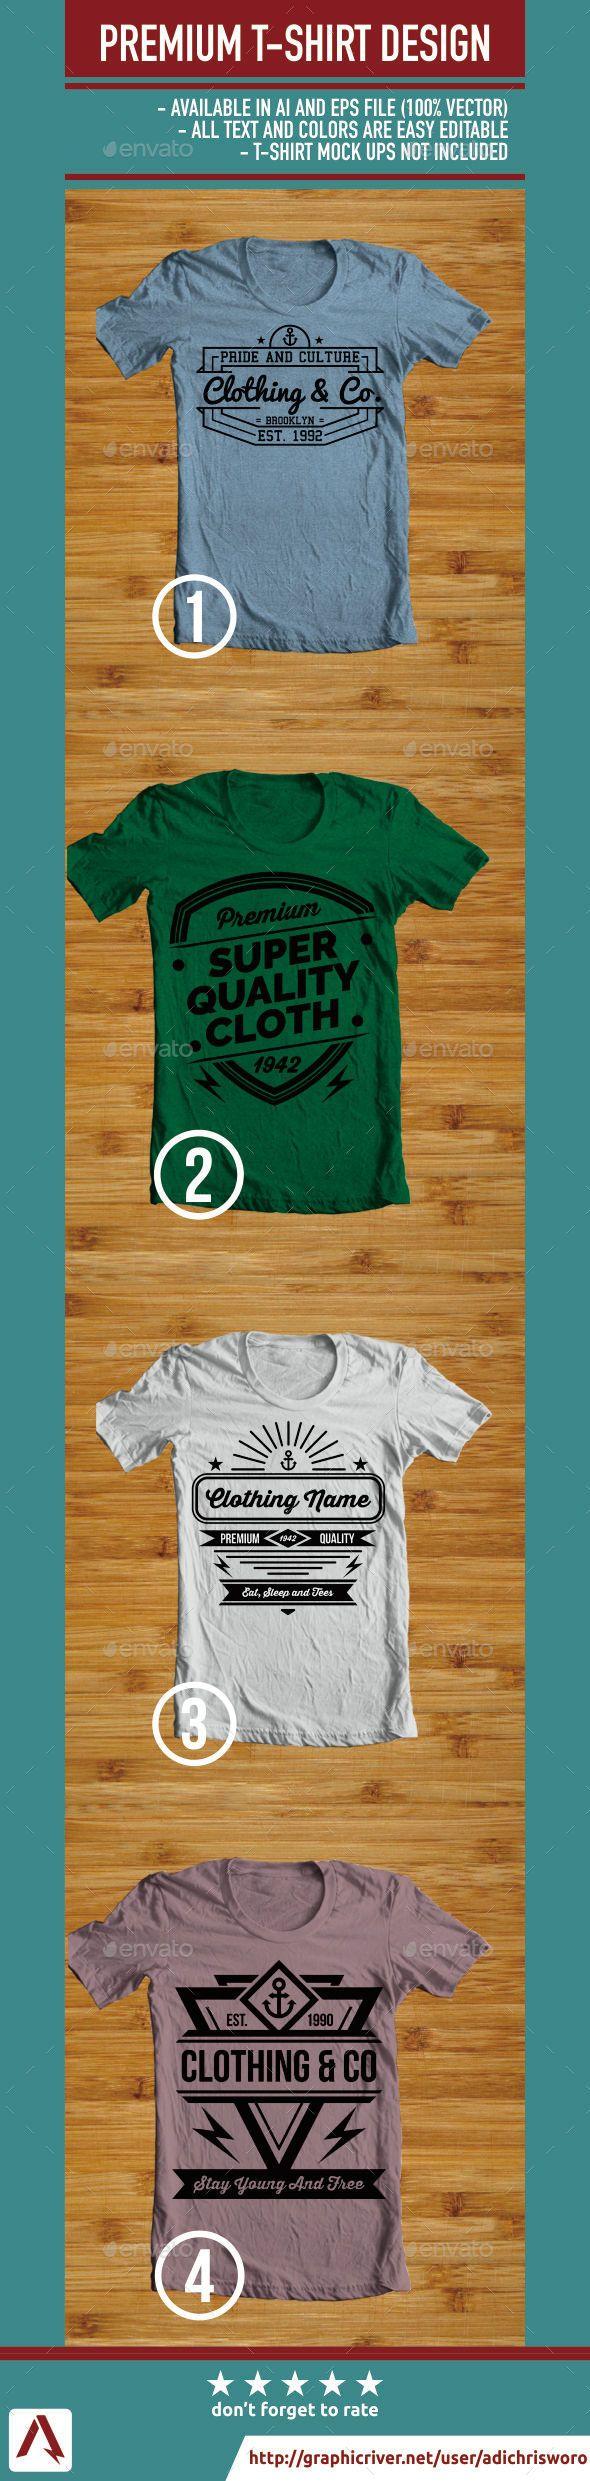 Black t shirt vector ai - Premium T Shirt Design Templates Vector Eps Ai Download Http